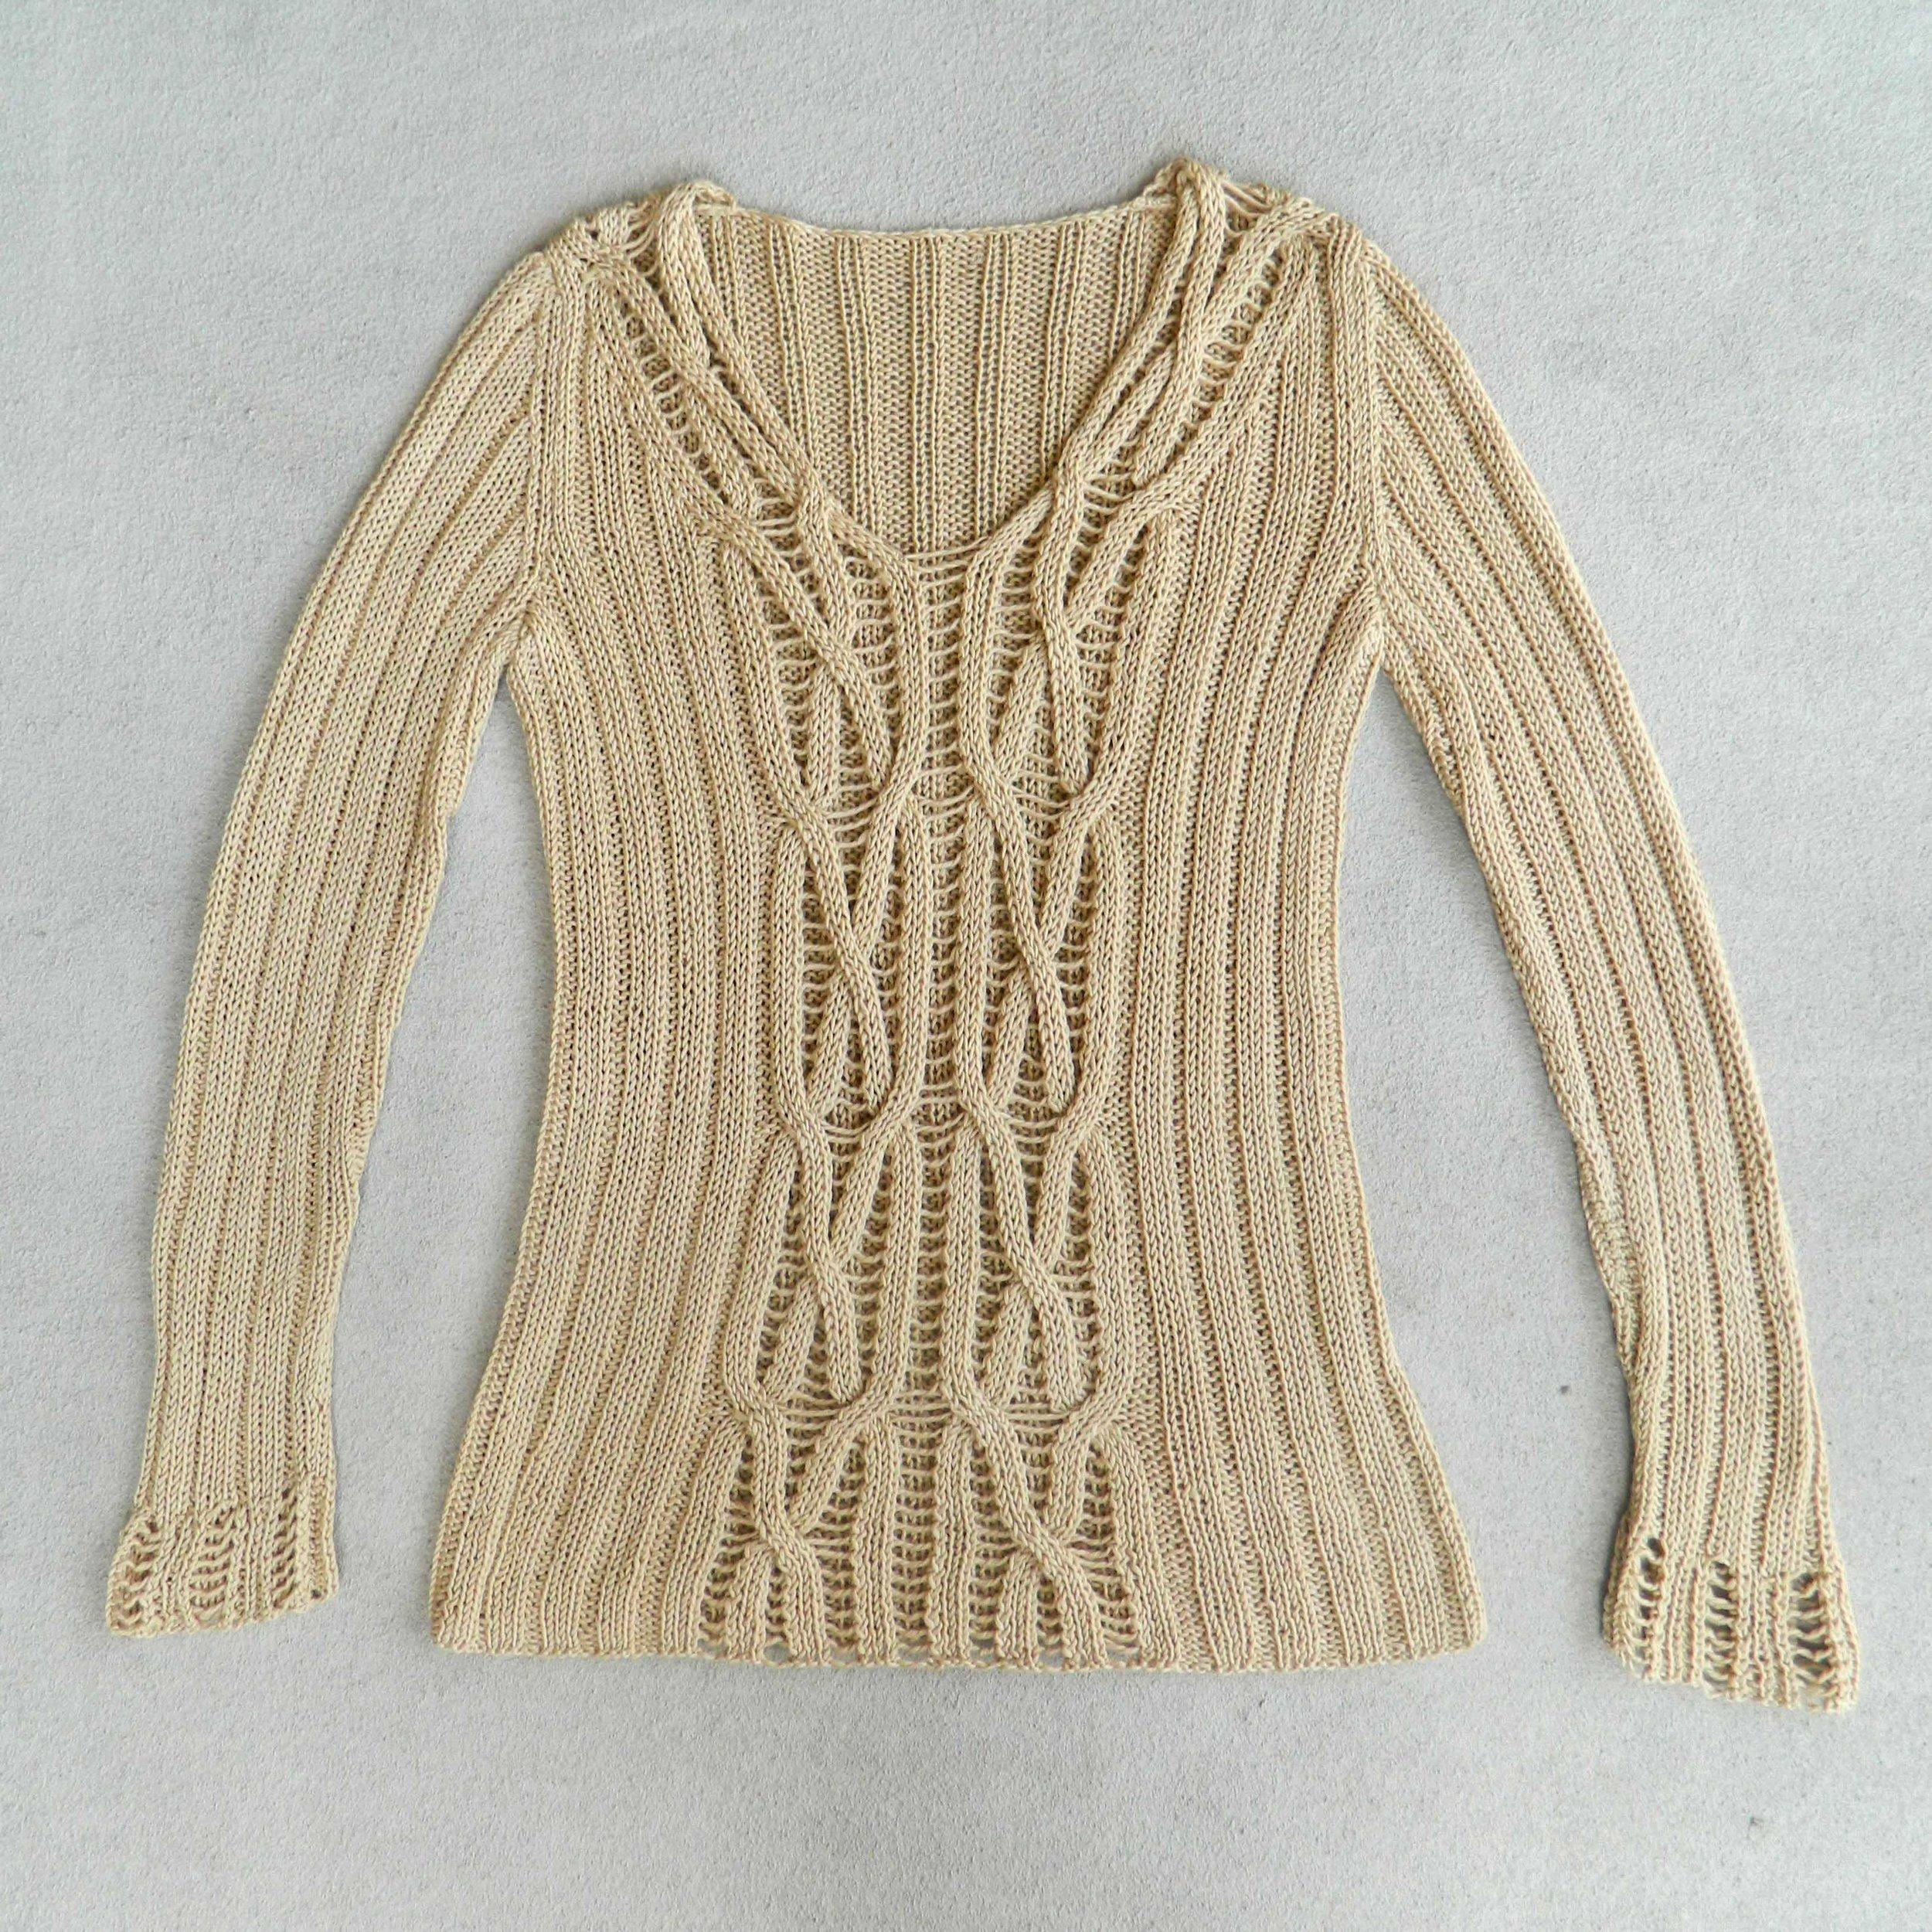 Giuliano&GiusyMarelli_Flat_Pull Onde di sabbia_Knit 'd' Crochet Collection.jpg